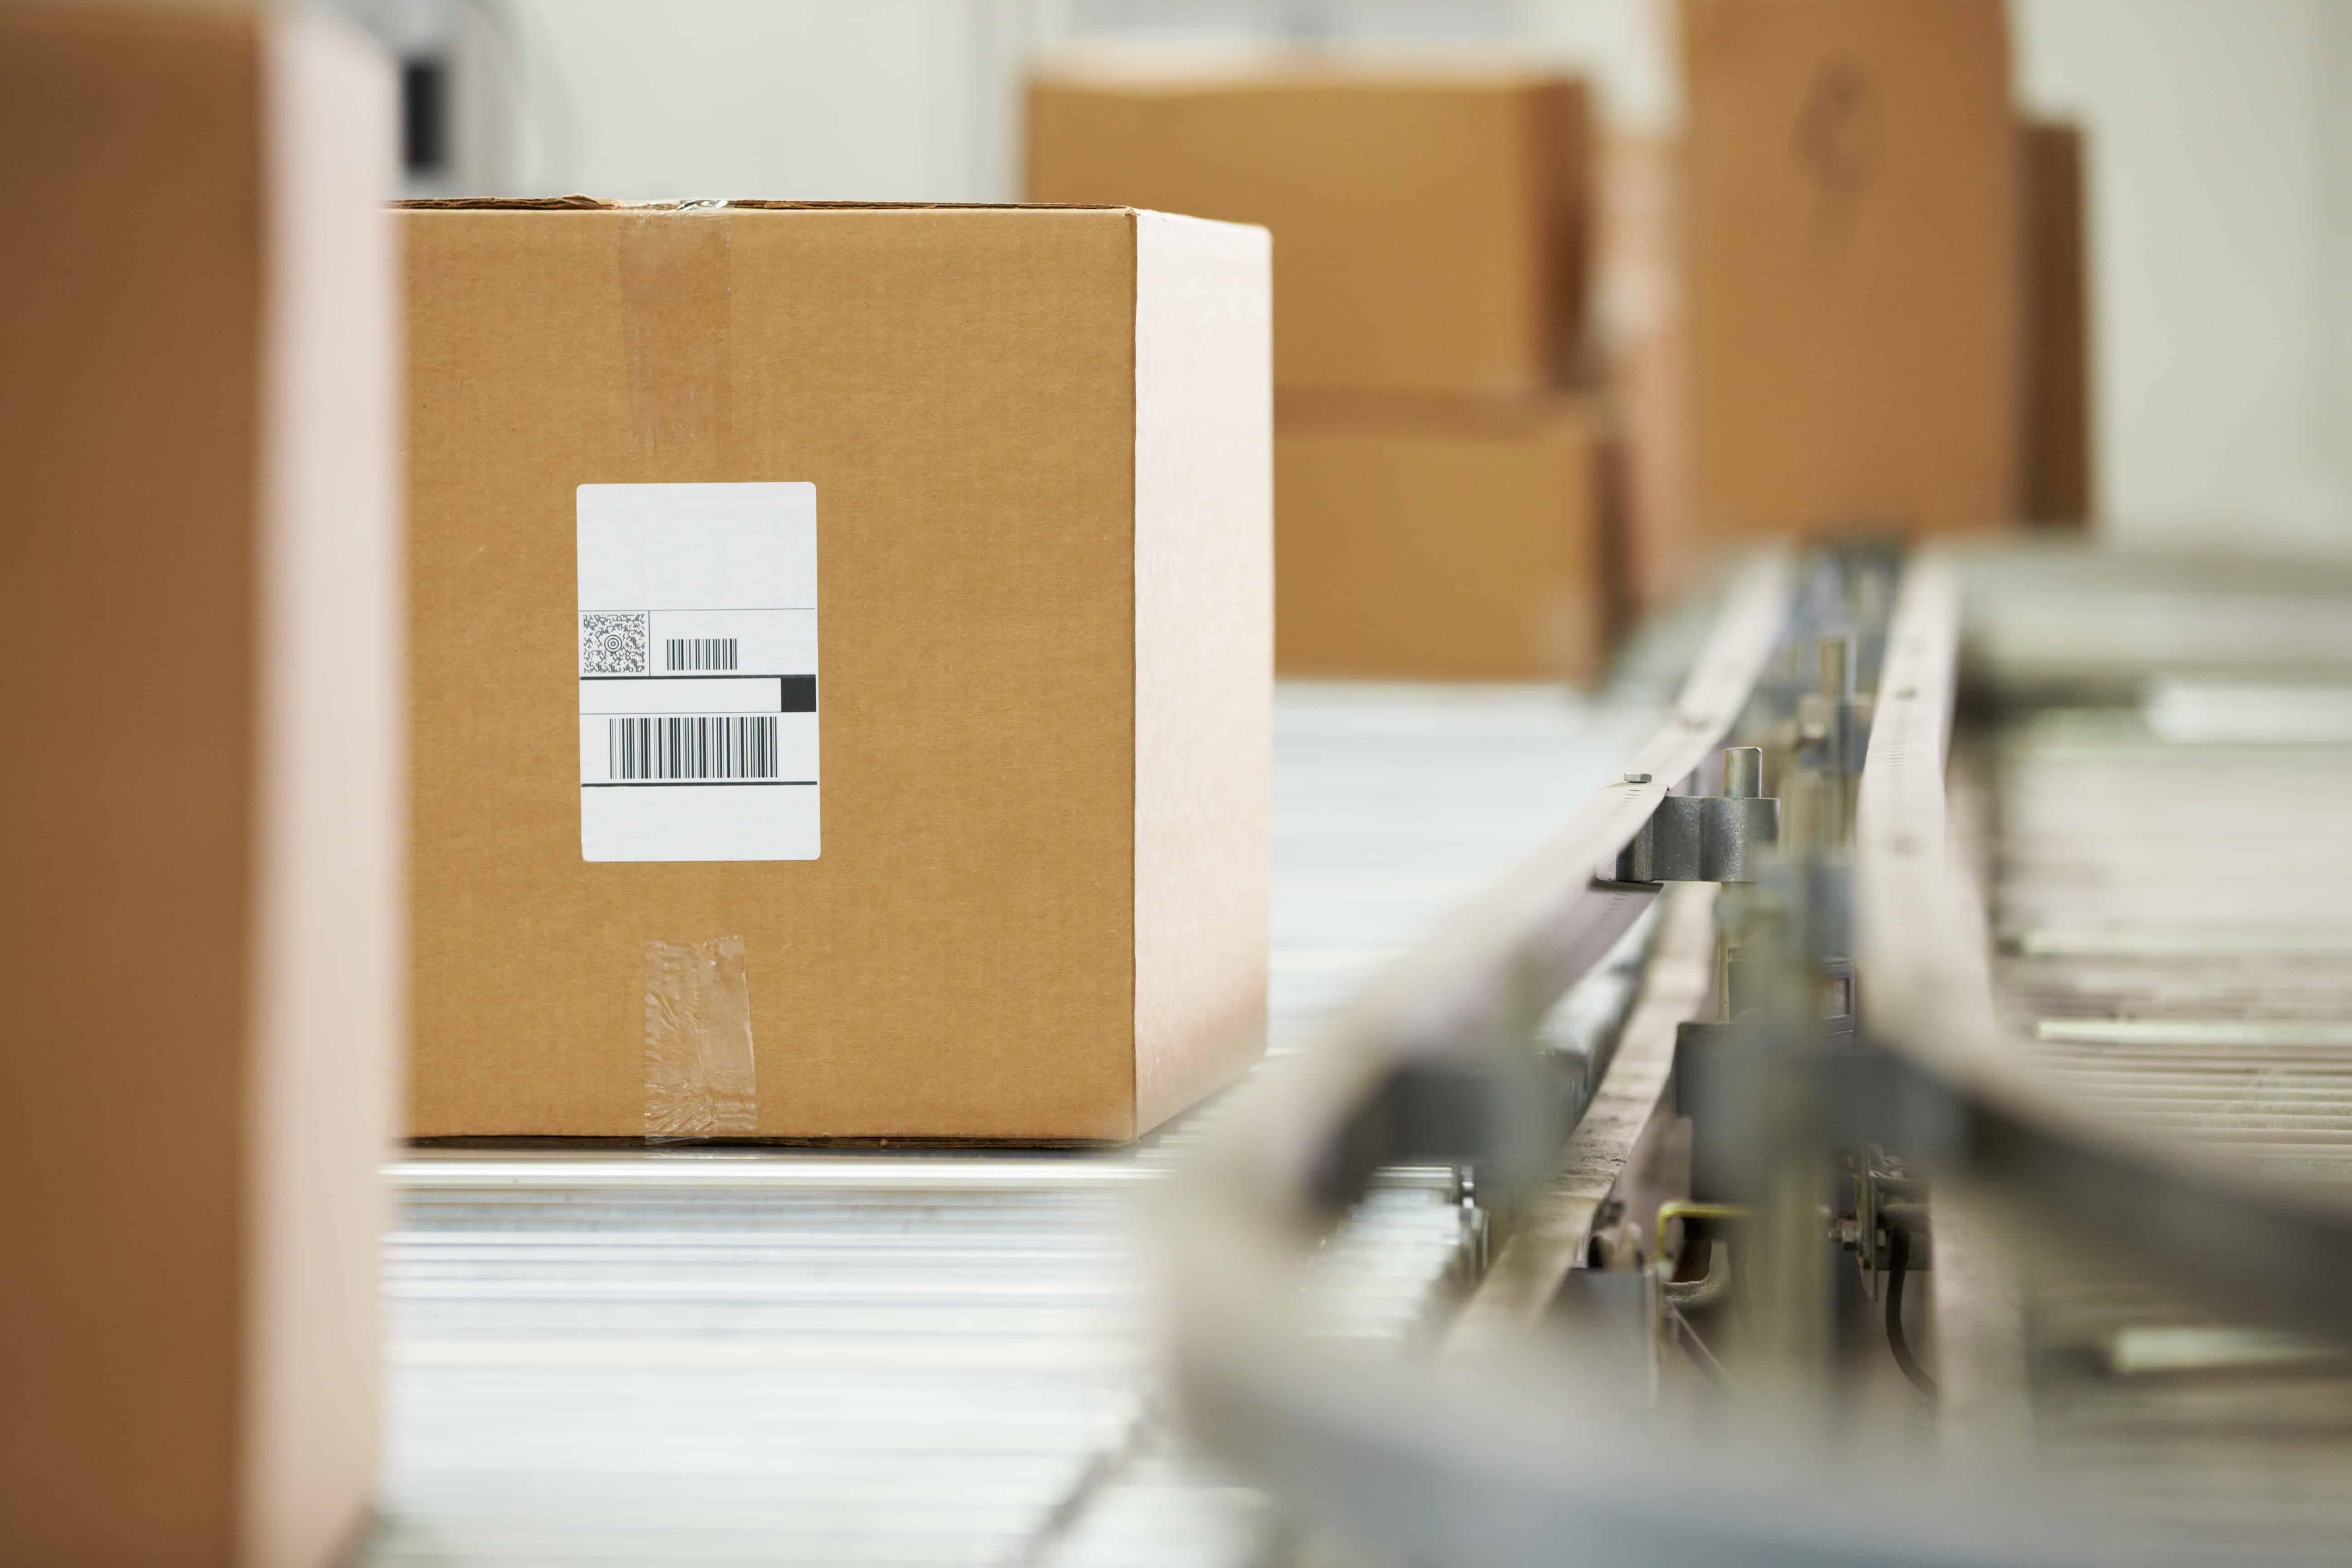 ecommerce fulfillment warehouse conveyor